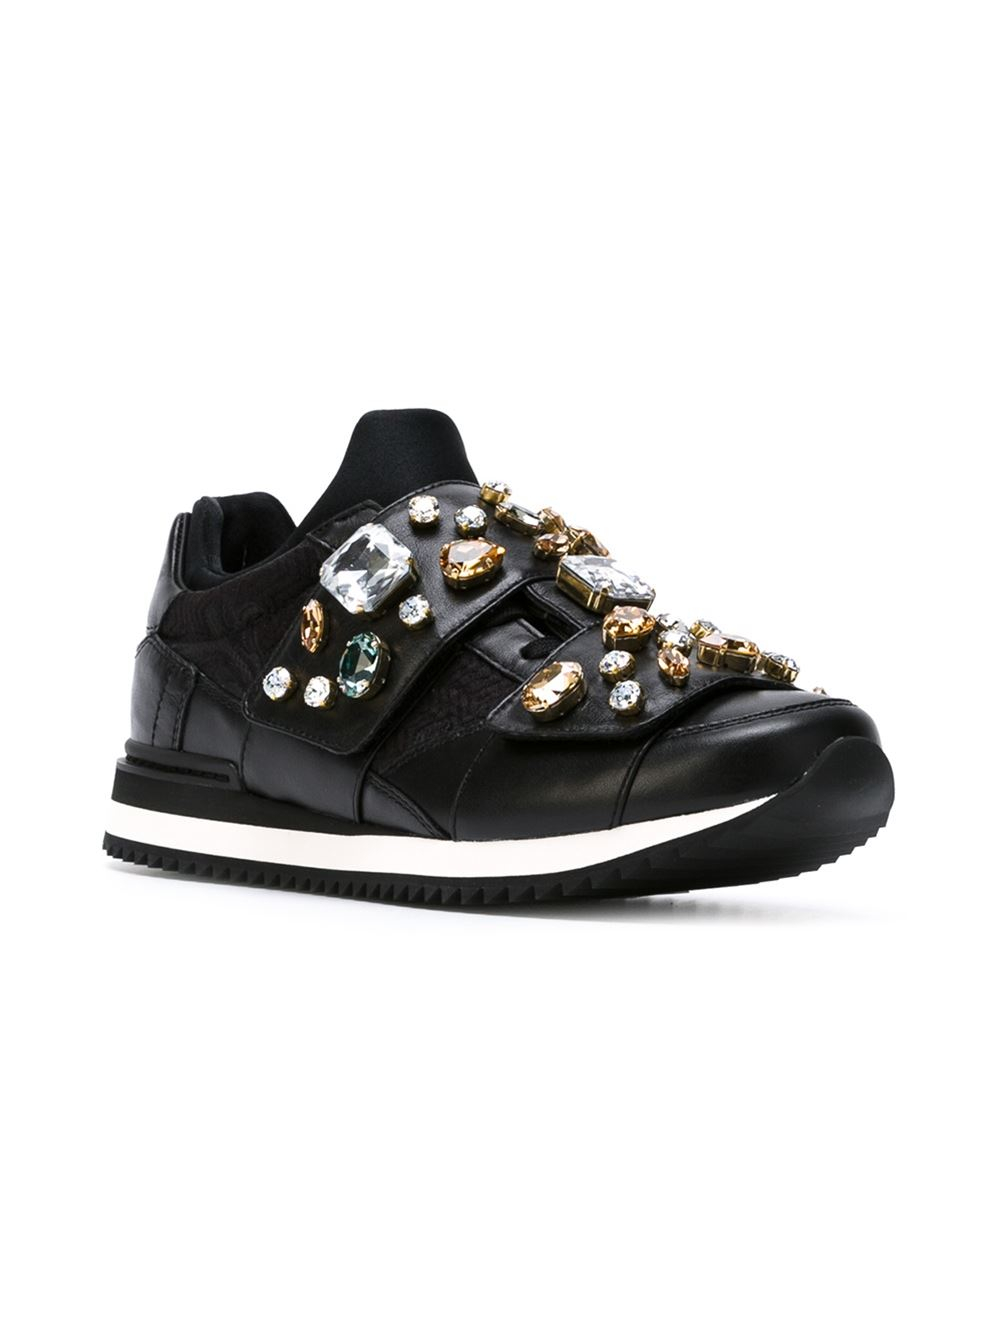 Dolce & Gabbana Crystal Embellished Sneakers in Black